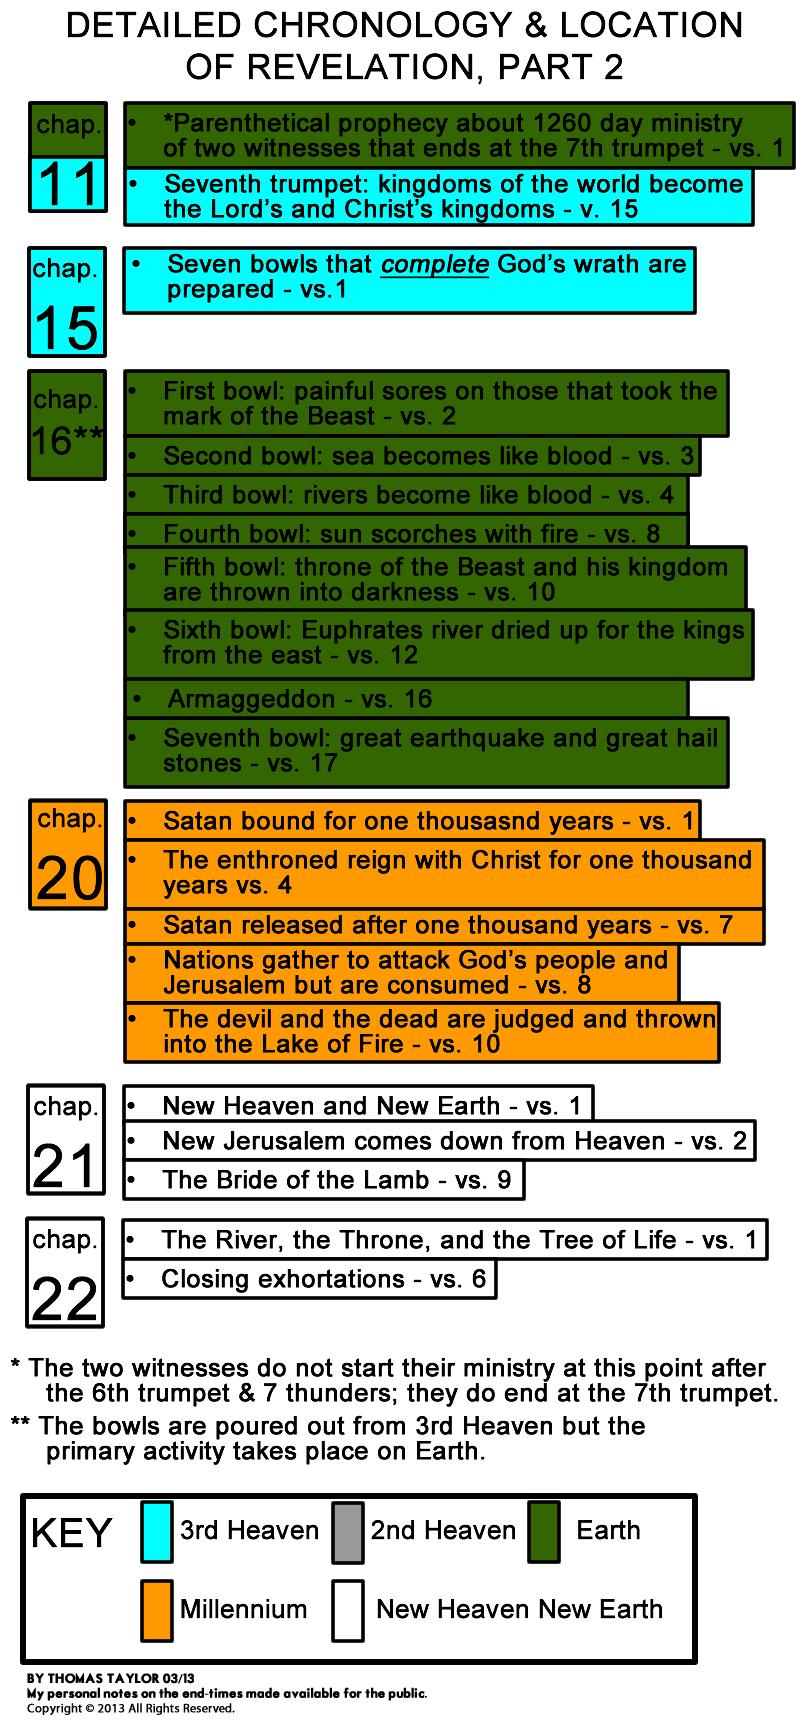 DETAILED CHRONOLOGY OF REVELATION PART 2